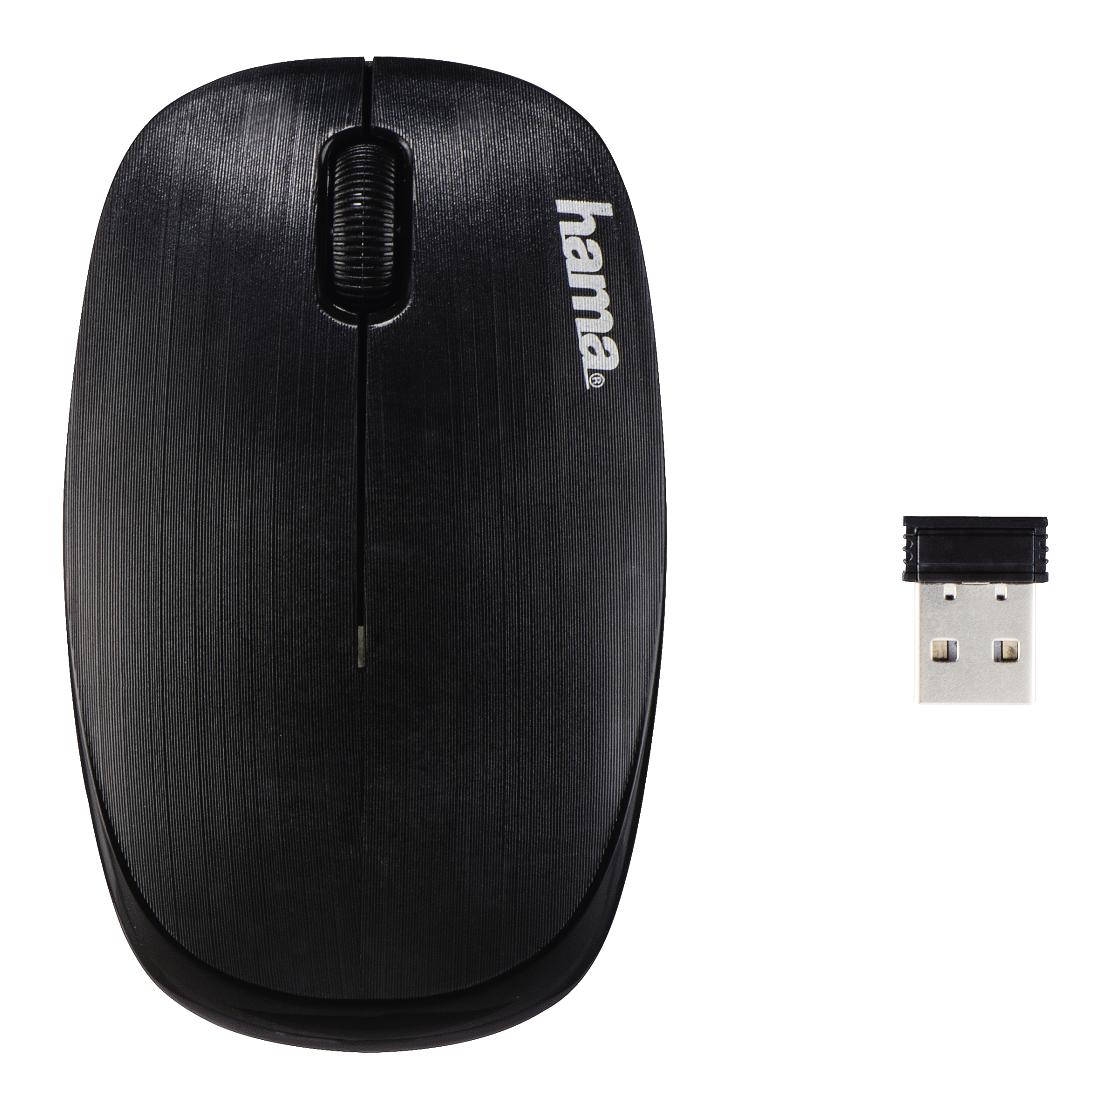 HAMA AM 8000 Wireless Optical Mouse Windows Vista 64-BIT